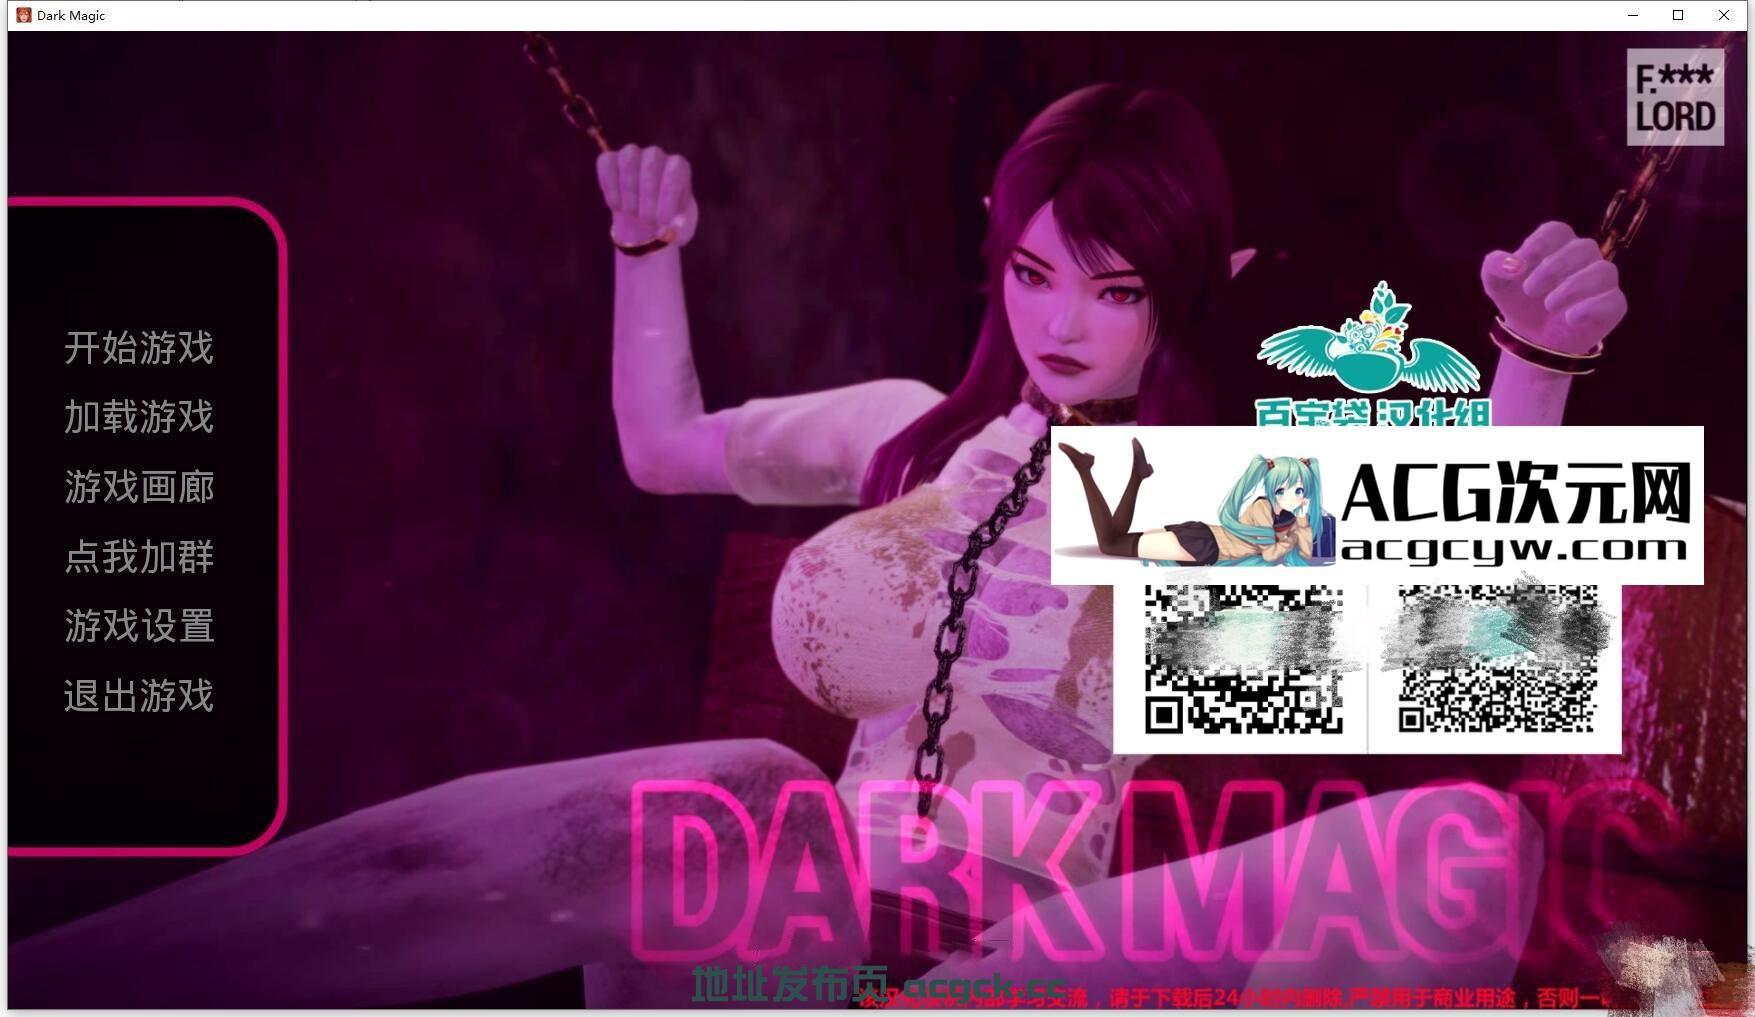 【SLG/汉化/动态CG】黑魔法 Dark Magic V1.1.23 精翻汉化作弊版+全CG【更新/安卓/2G】